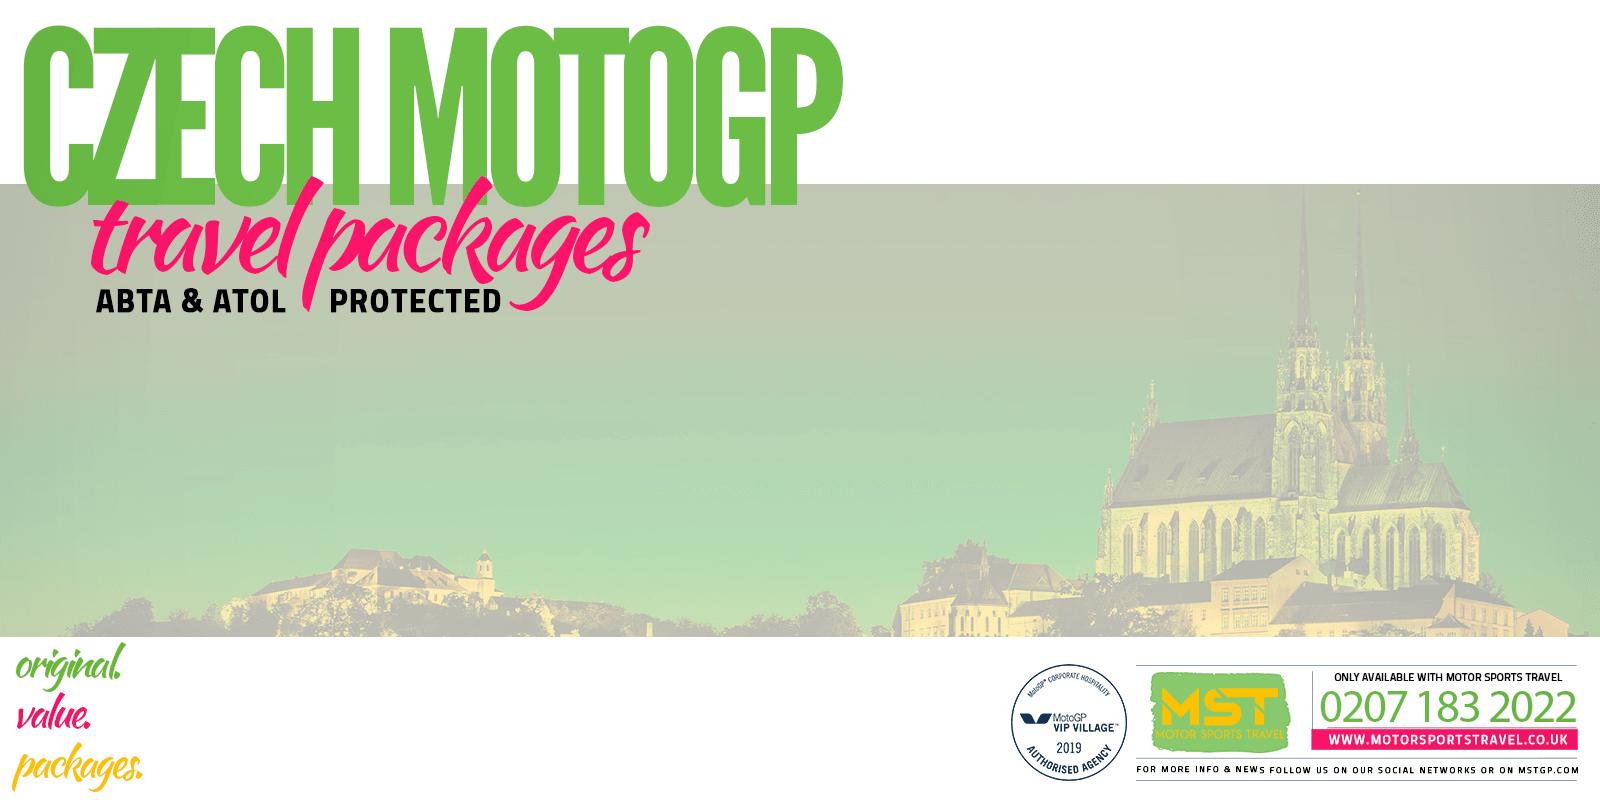 Calendario F1 2020 Sky.2019 Motogp Calendar Motogp Packages Motor Sports Travel